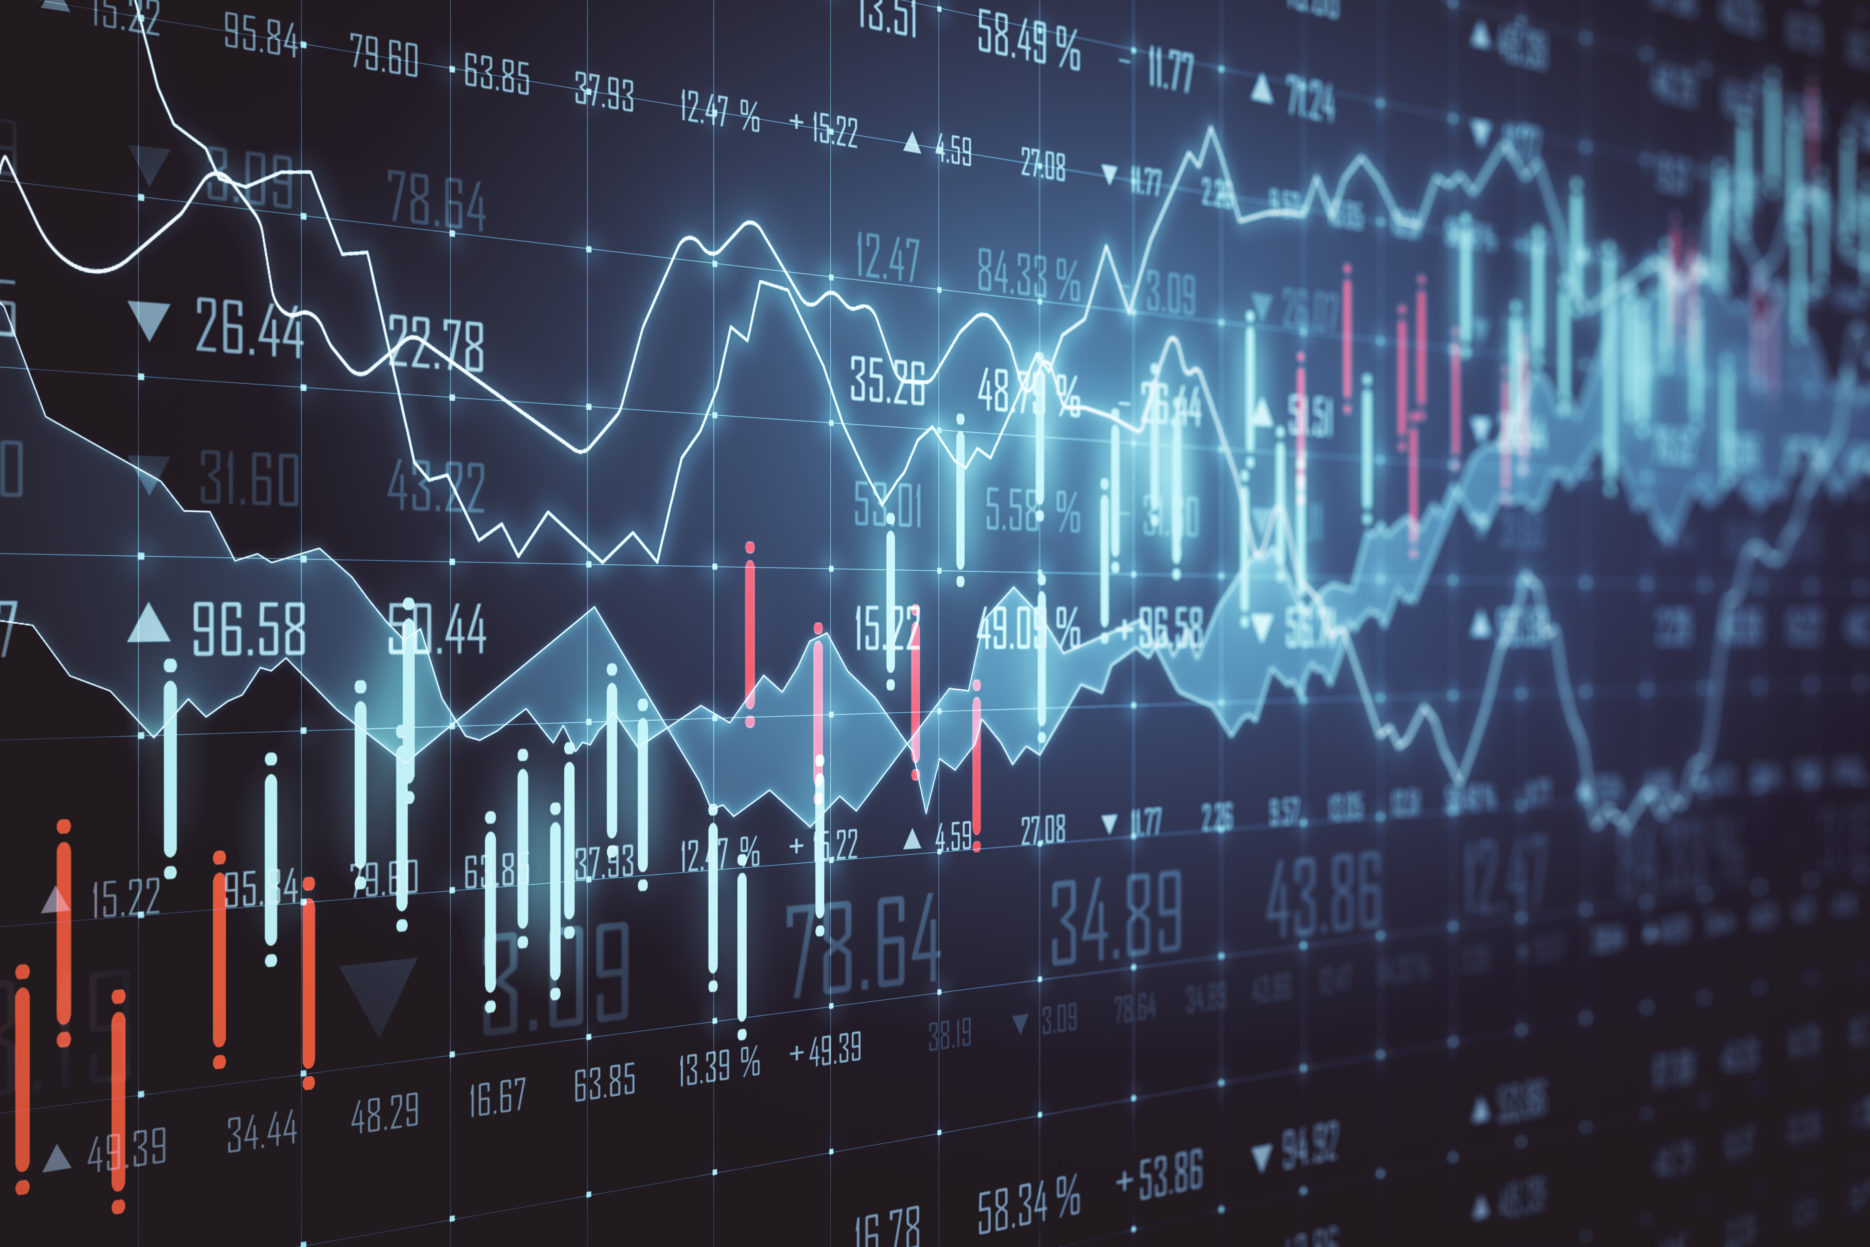 Stock exchange fluctuation